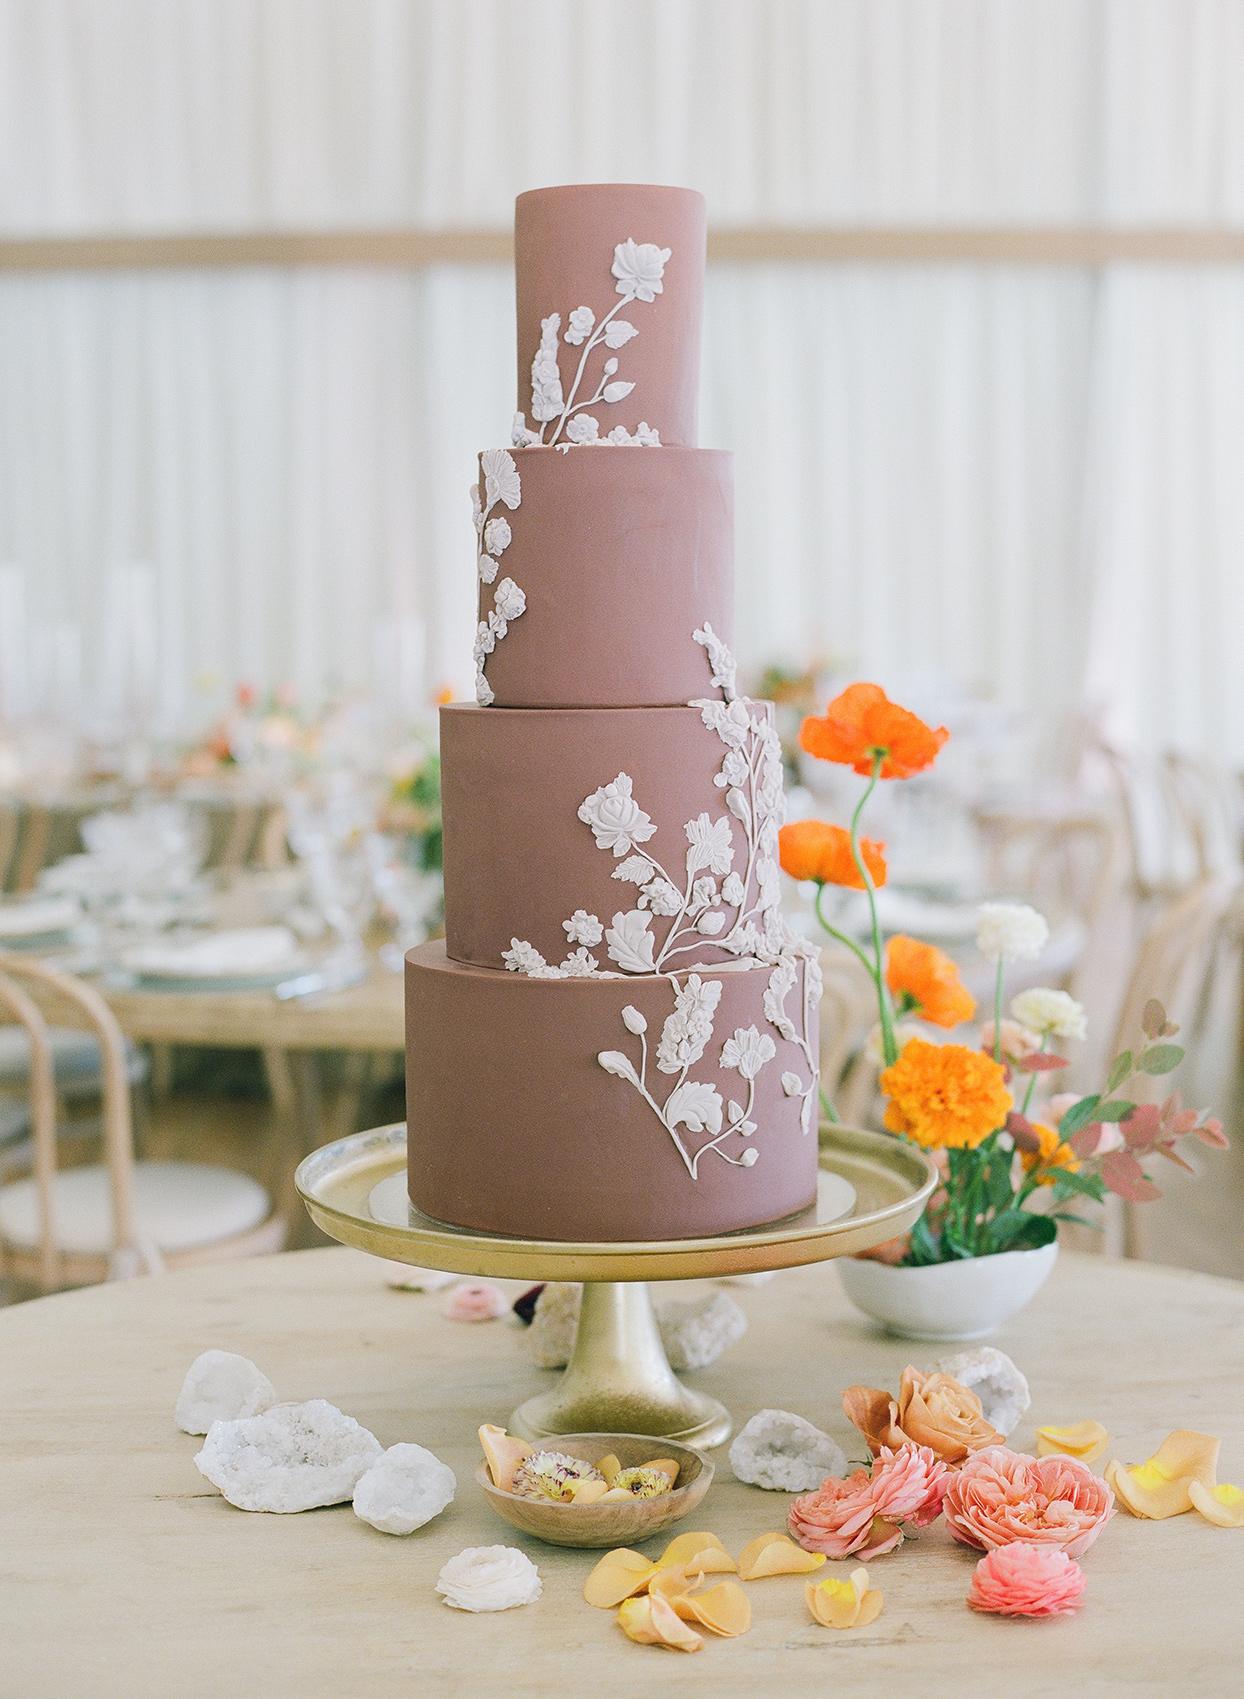 mauve fondant cake with white floral decor